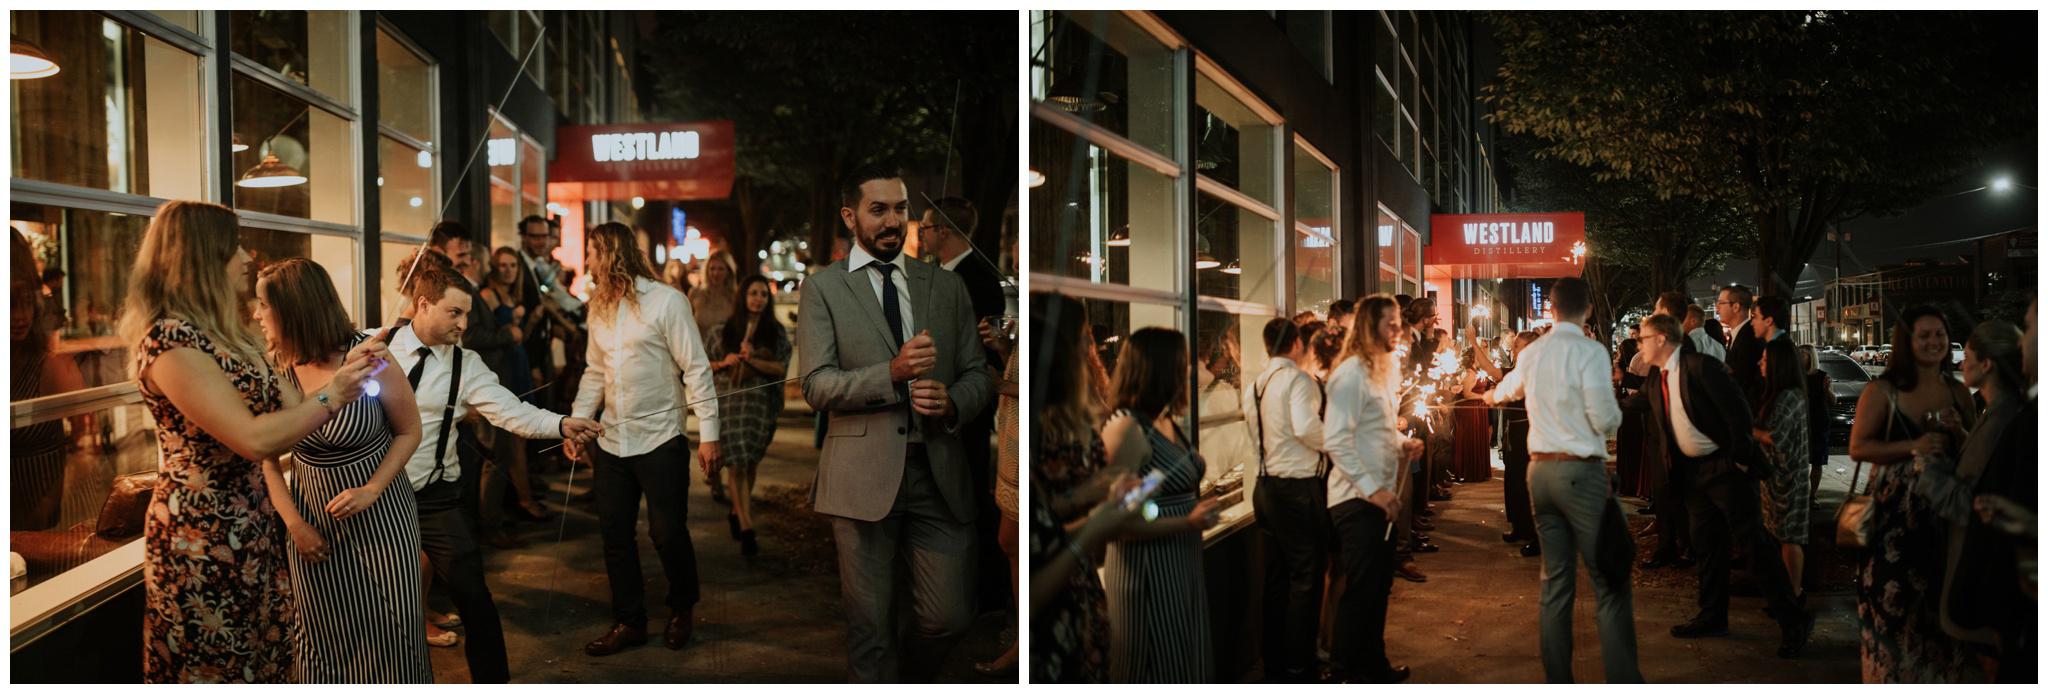 alyssa-keiran-westland-distillery-urban-seattle-wedding-photographer-caitlyn-nikula-172.jpg